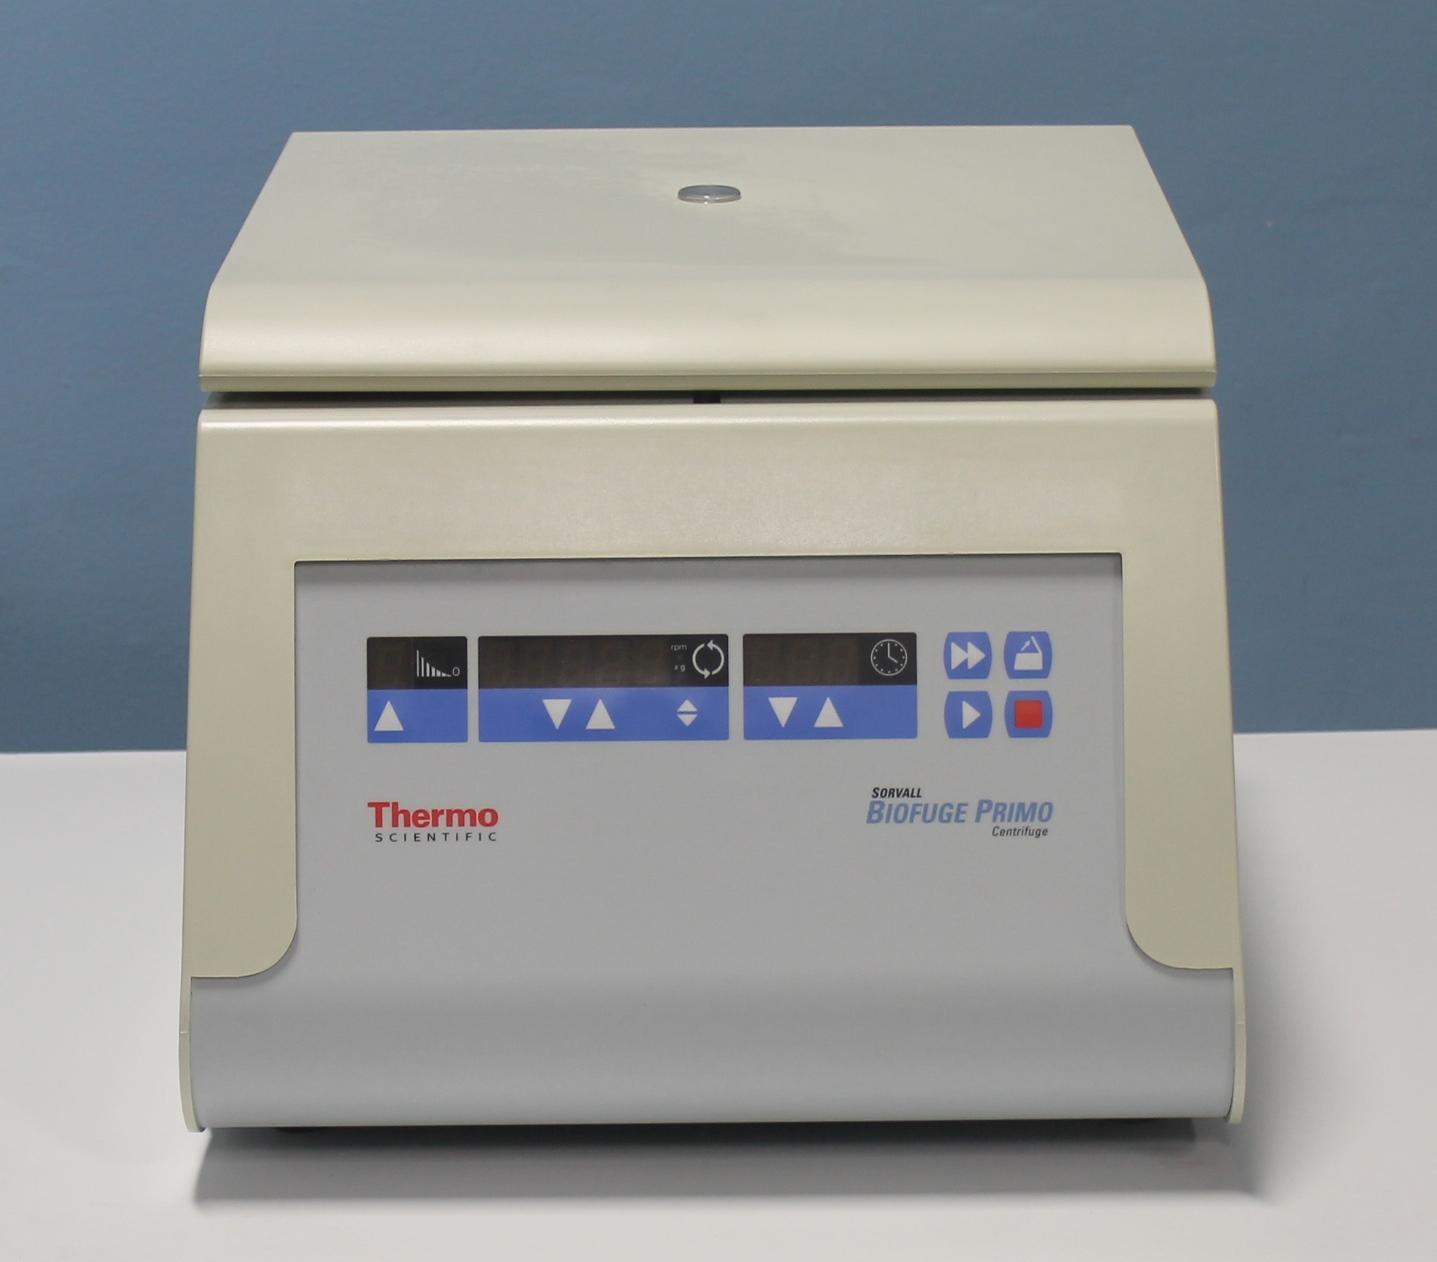 Thermo Scientific Sorvall Biofuge Primo Centrifuge Image